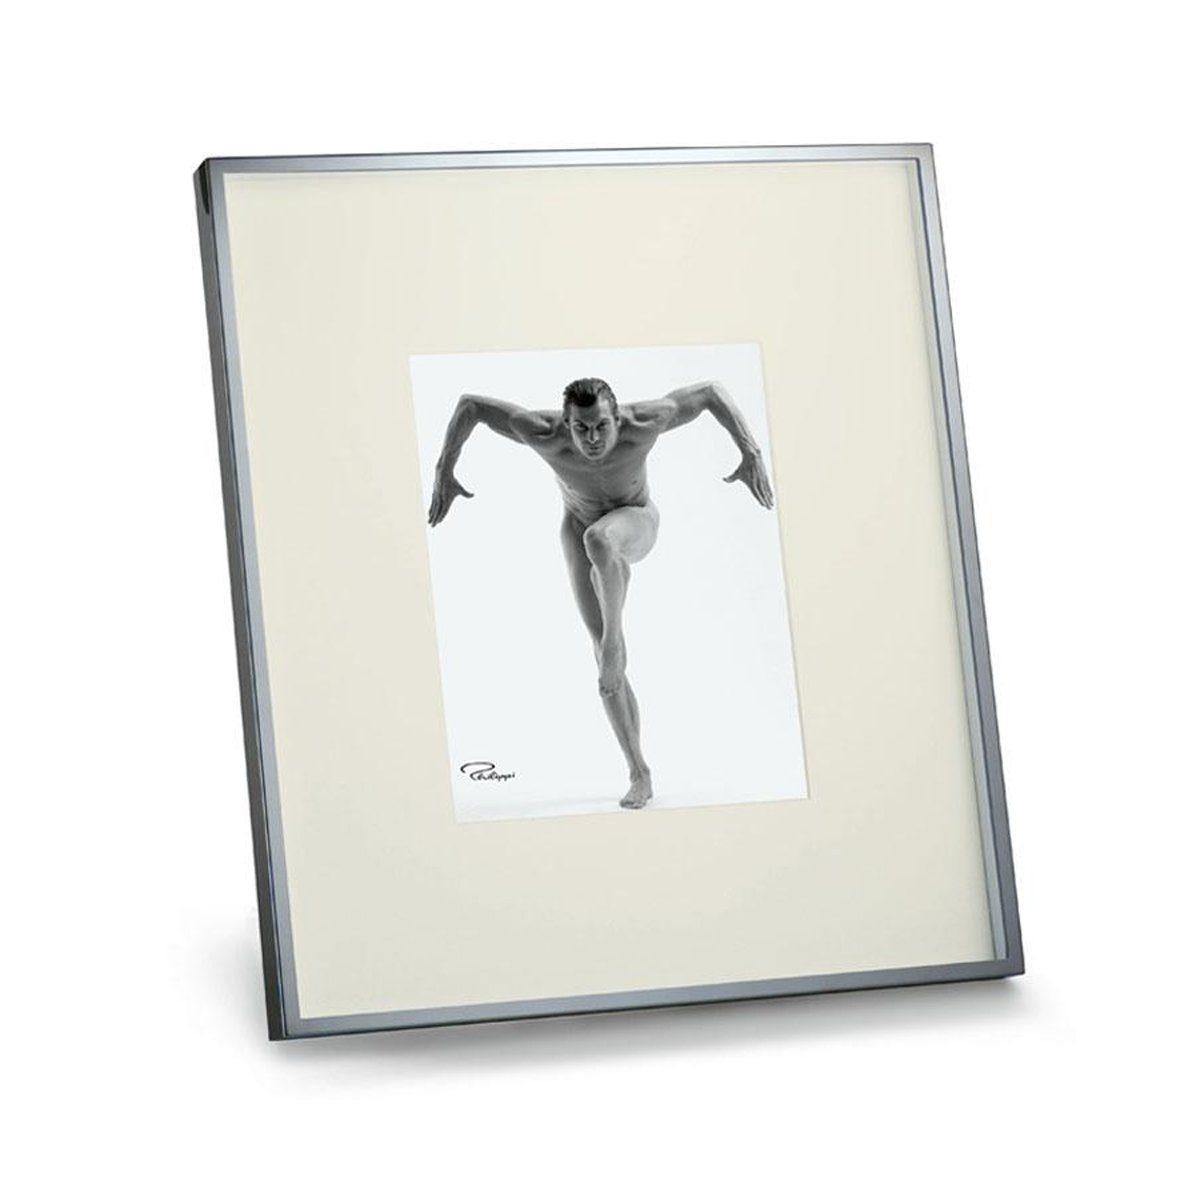 Philippi Philippi Bilderrahmen PORTRAIT 20x25 cm